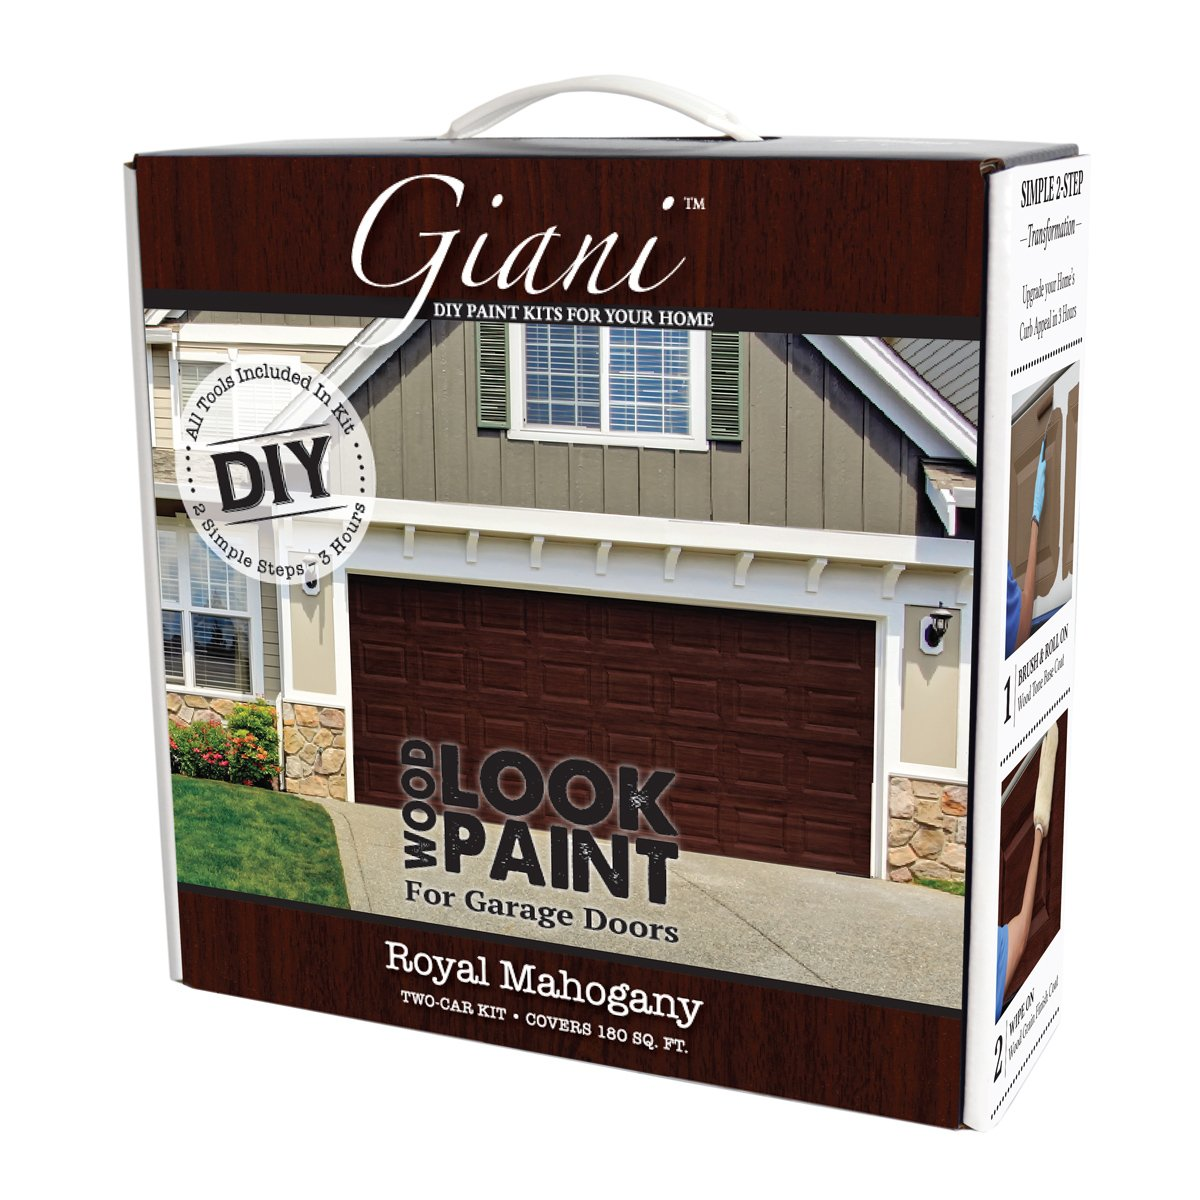 Giani Wood Look Garage Door Paint Kit, 2 Car, Royal Mahogany Inc.